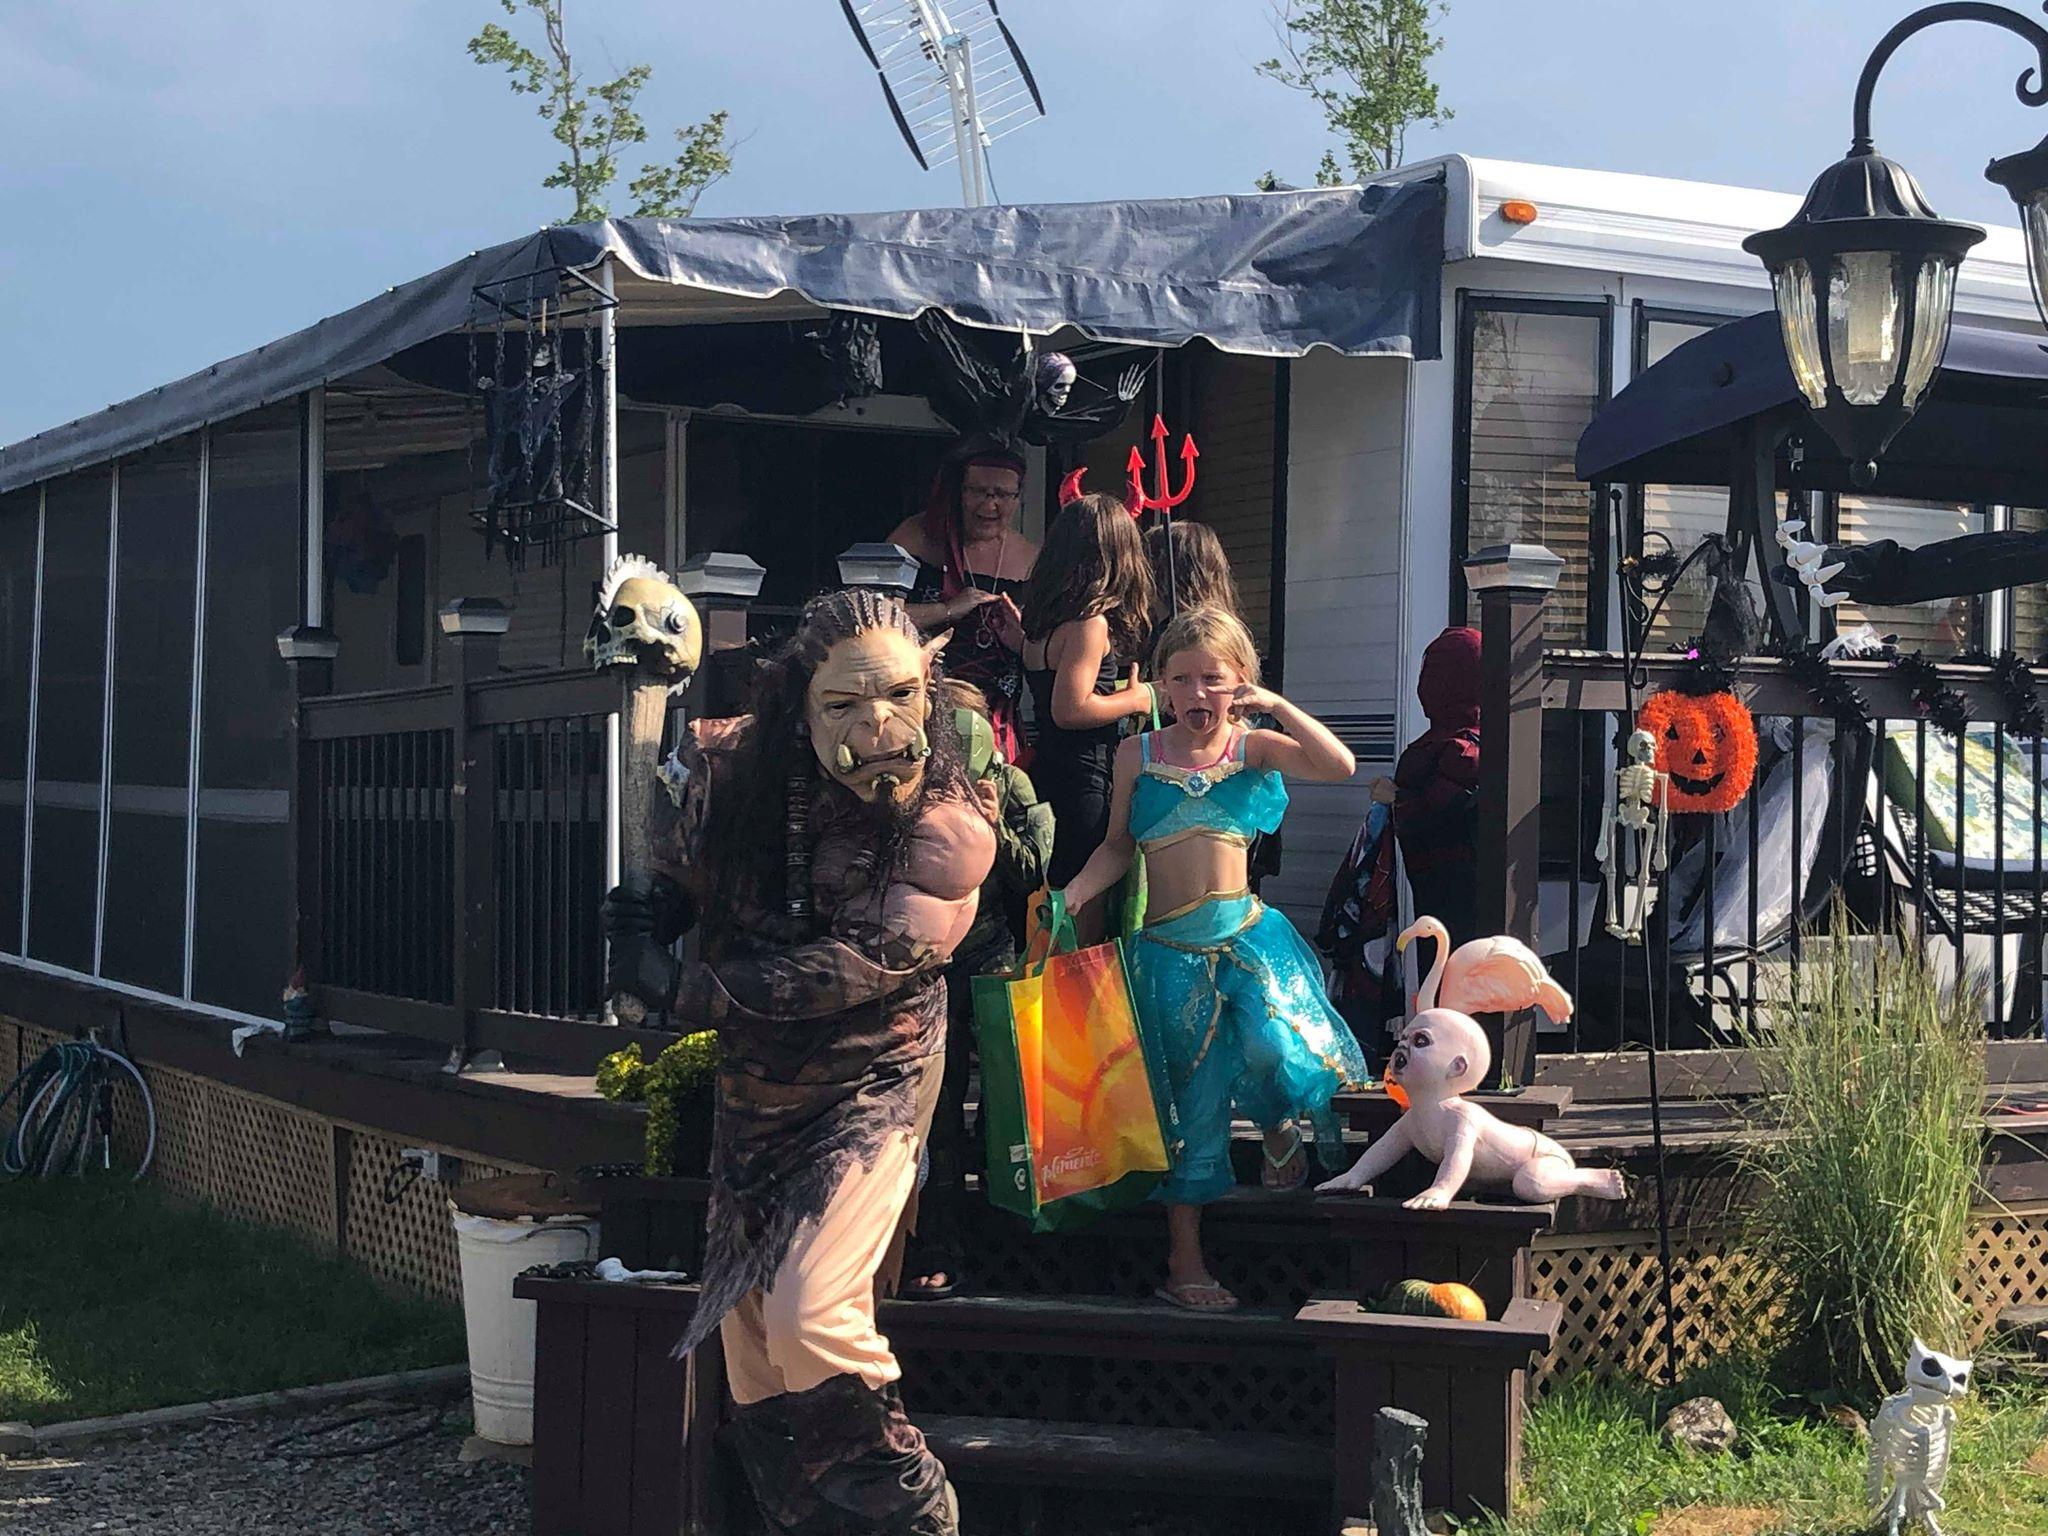 http://www.campingatlantide.com/wp-content/uploads/2019/07/halloween-complexe-atlantide-2019-15.jpg